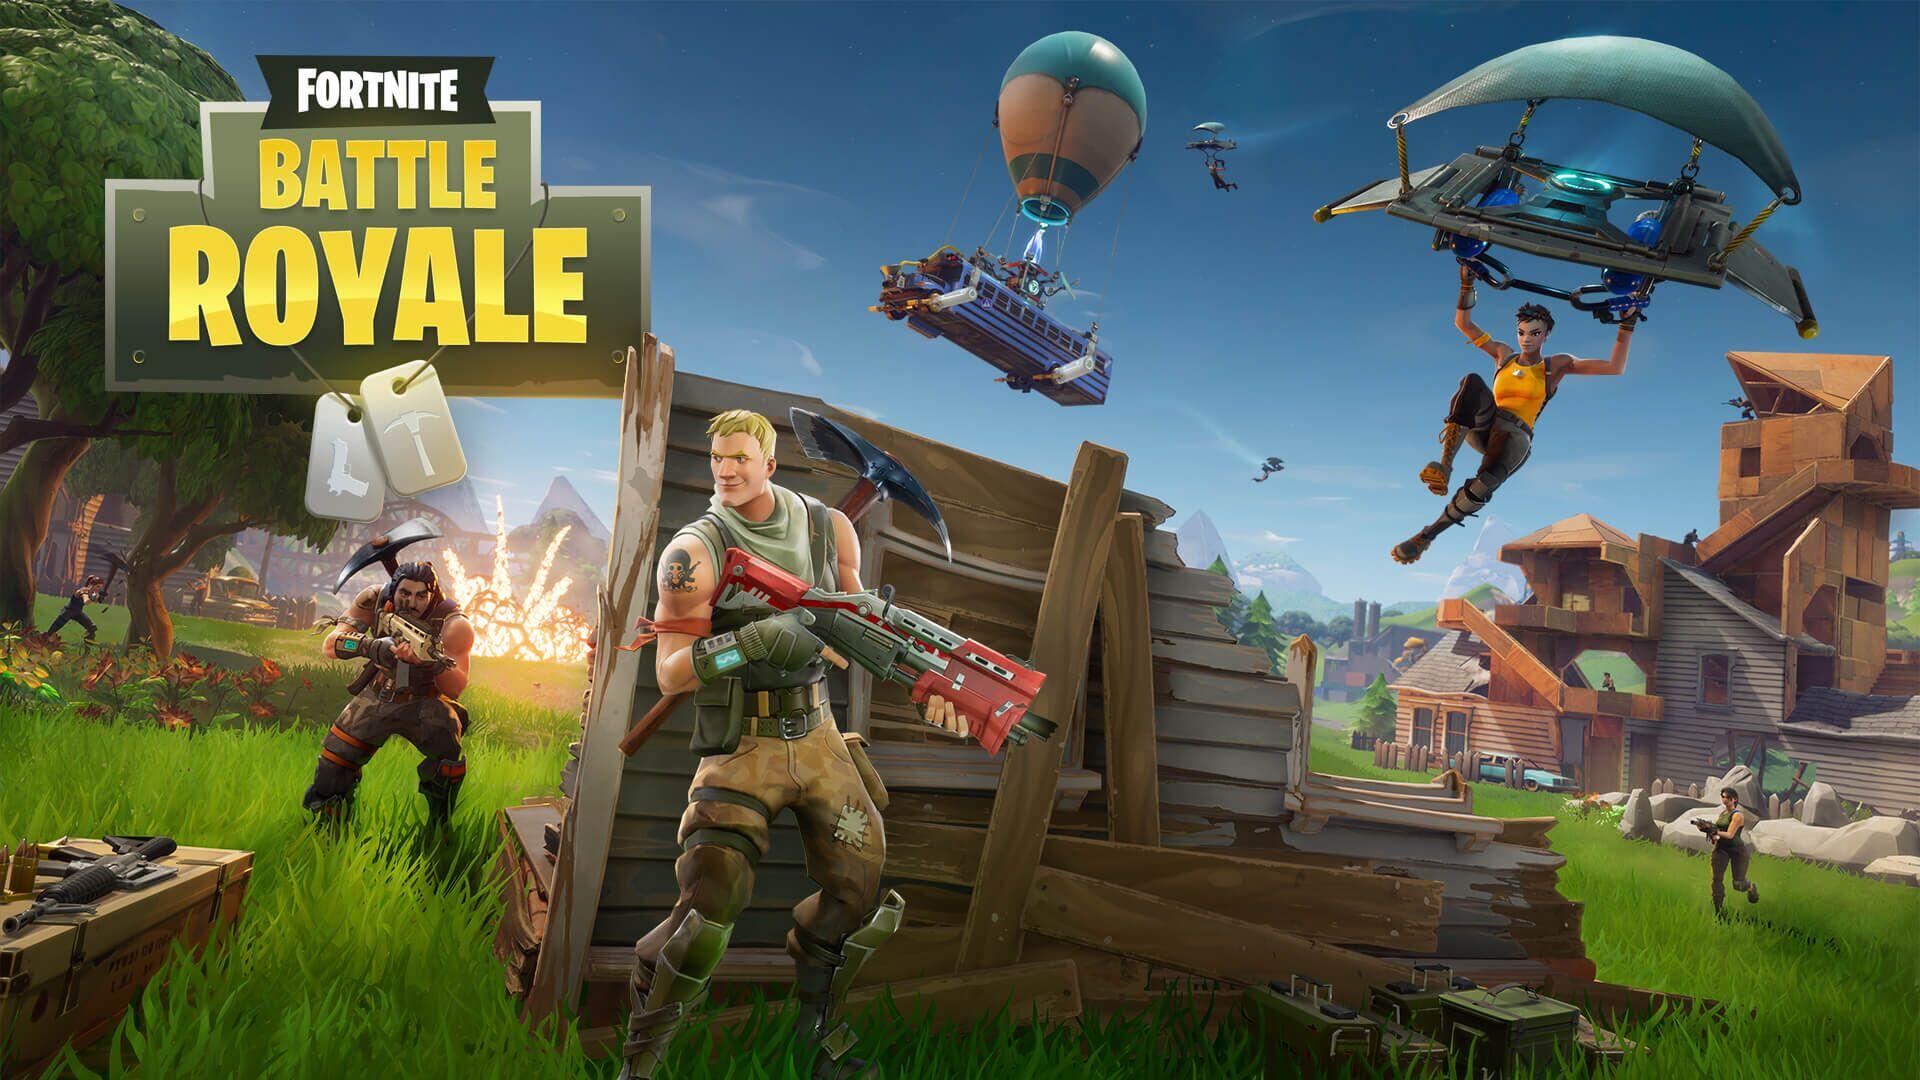 Fortnite Season 4 Week 2 Challenges Leaked For Battle Royale Mode